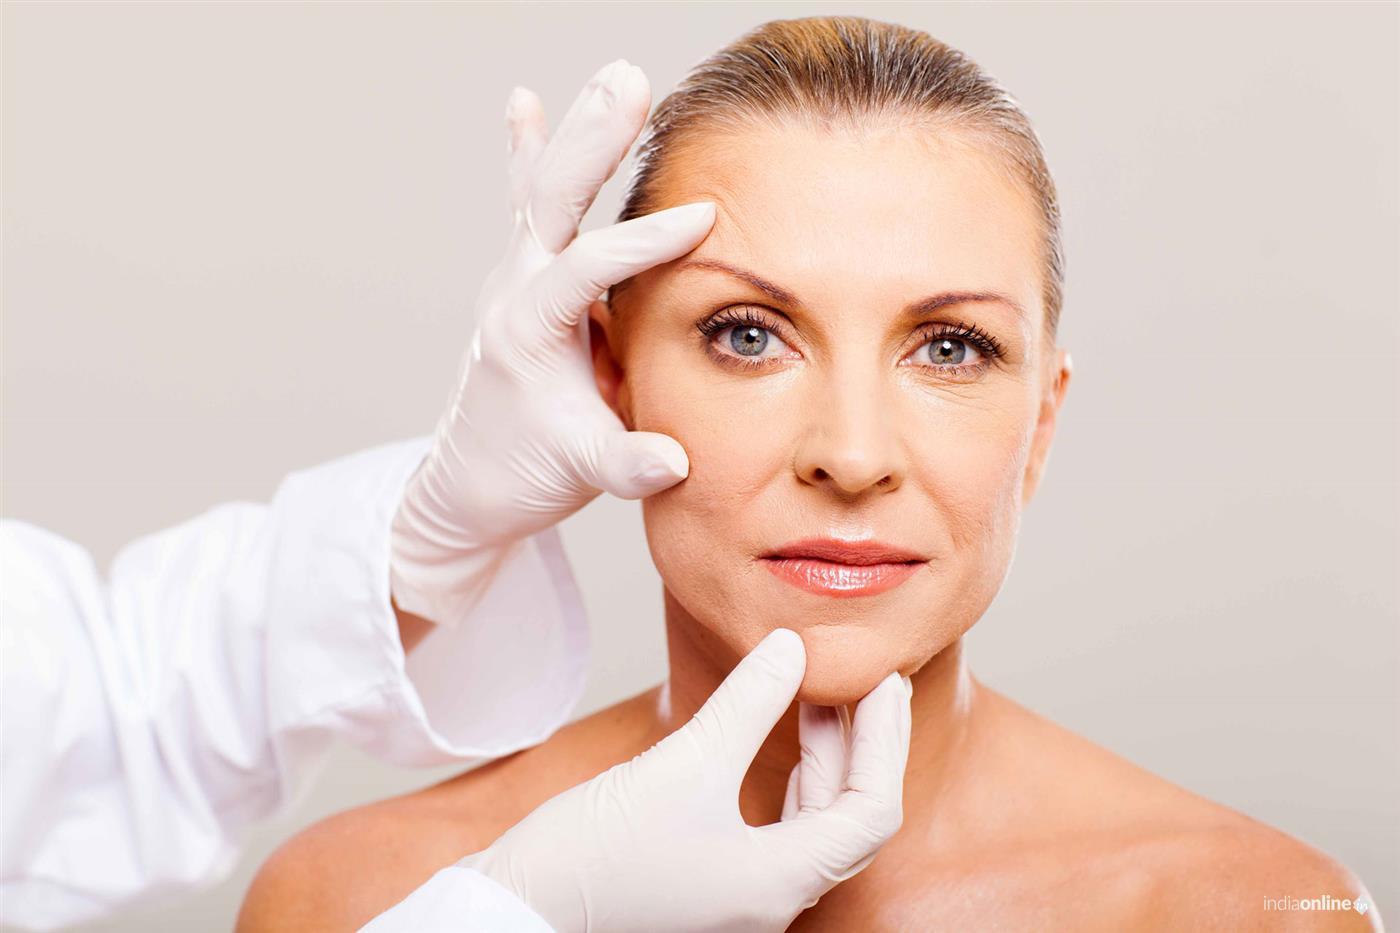 Liposuction & Blepharoplasty Eye Lid Surgery